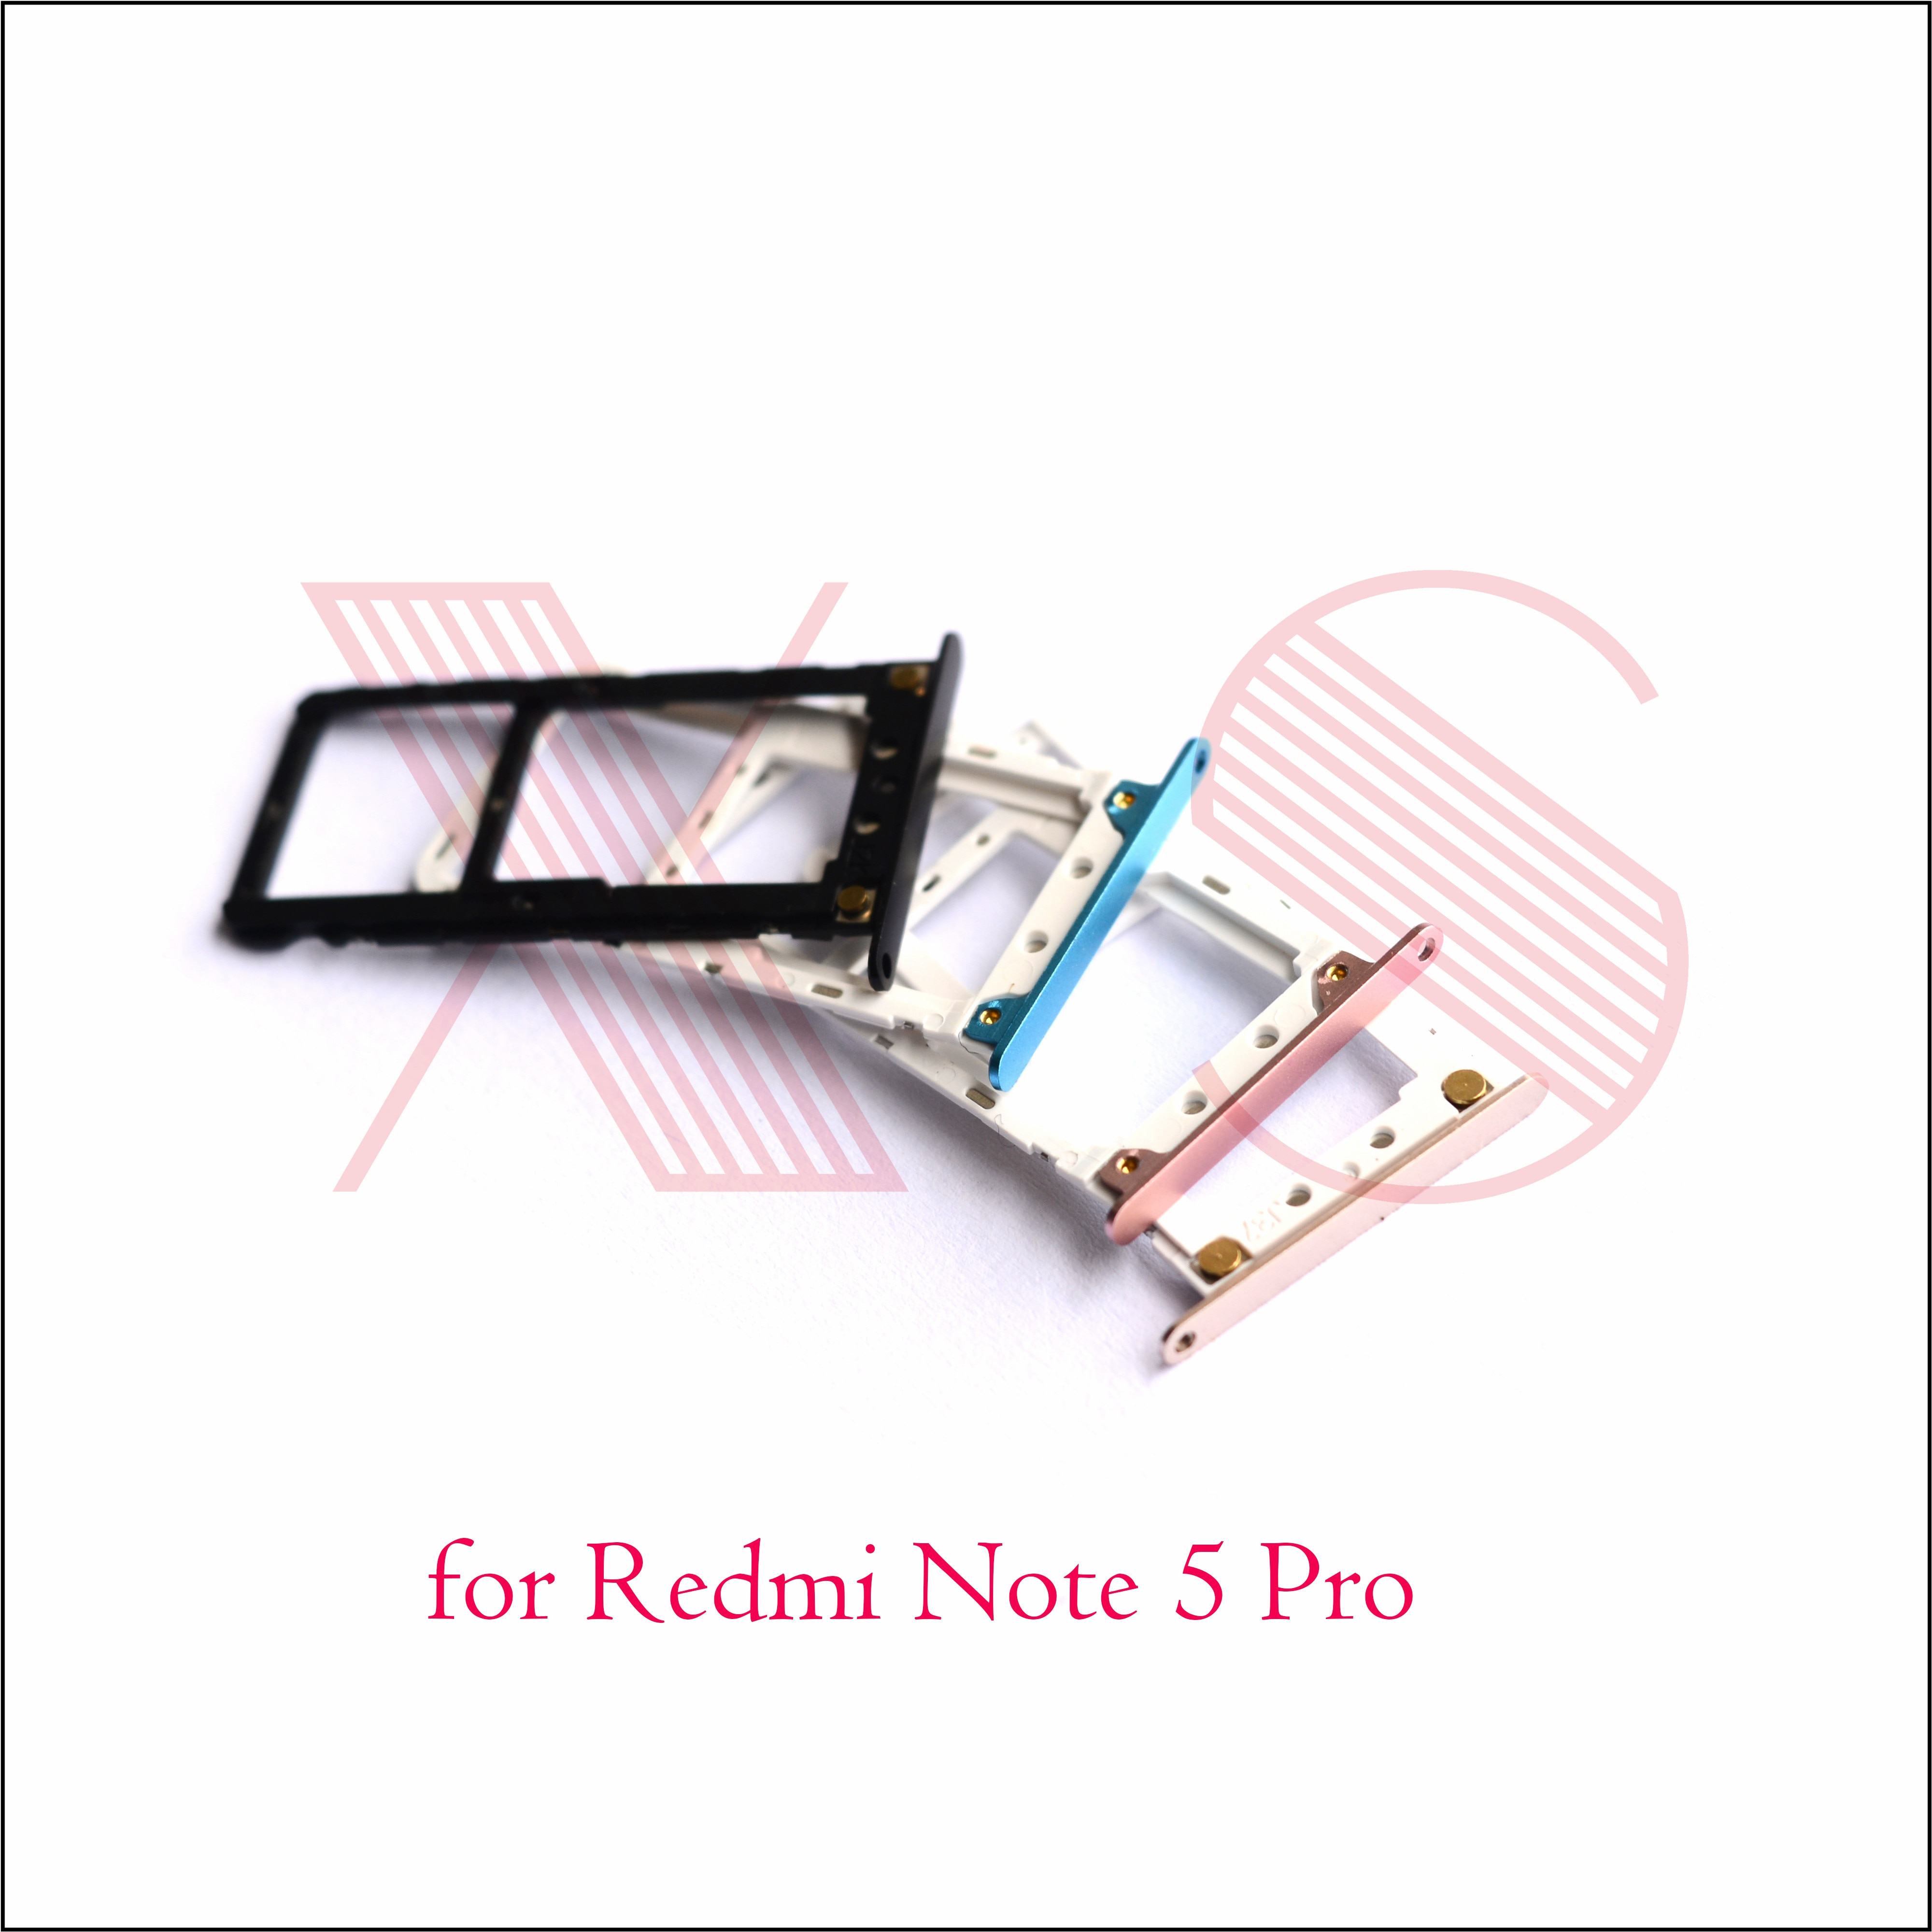 Soporte para tarjeta Micro SIM/bandeja de tarjetas Micro SIM, adaptador de ranura para tarjeta Micro SD para Xiaomi Redmi Note 5 /Pro /Prime duam Cámara AI 636CPU